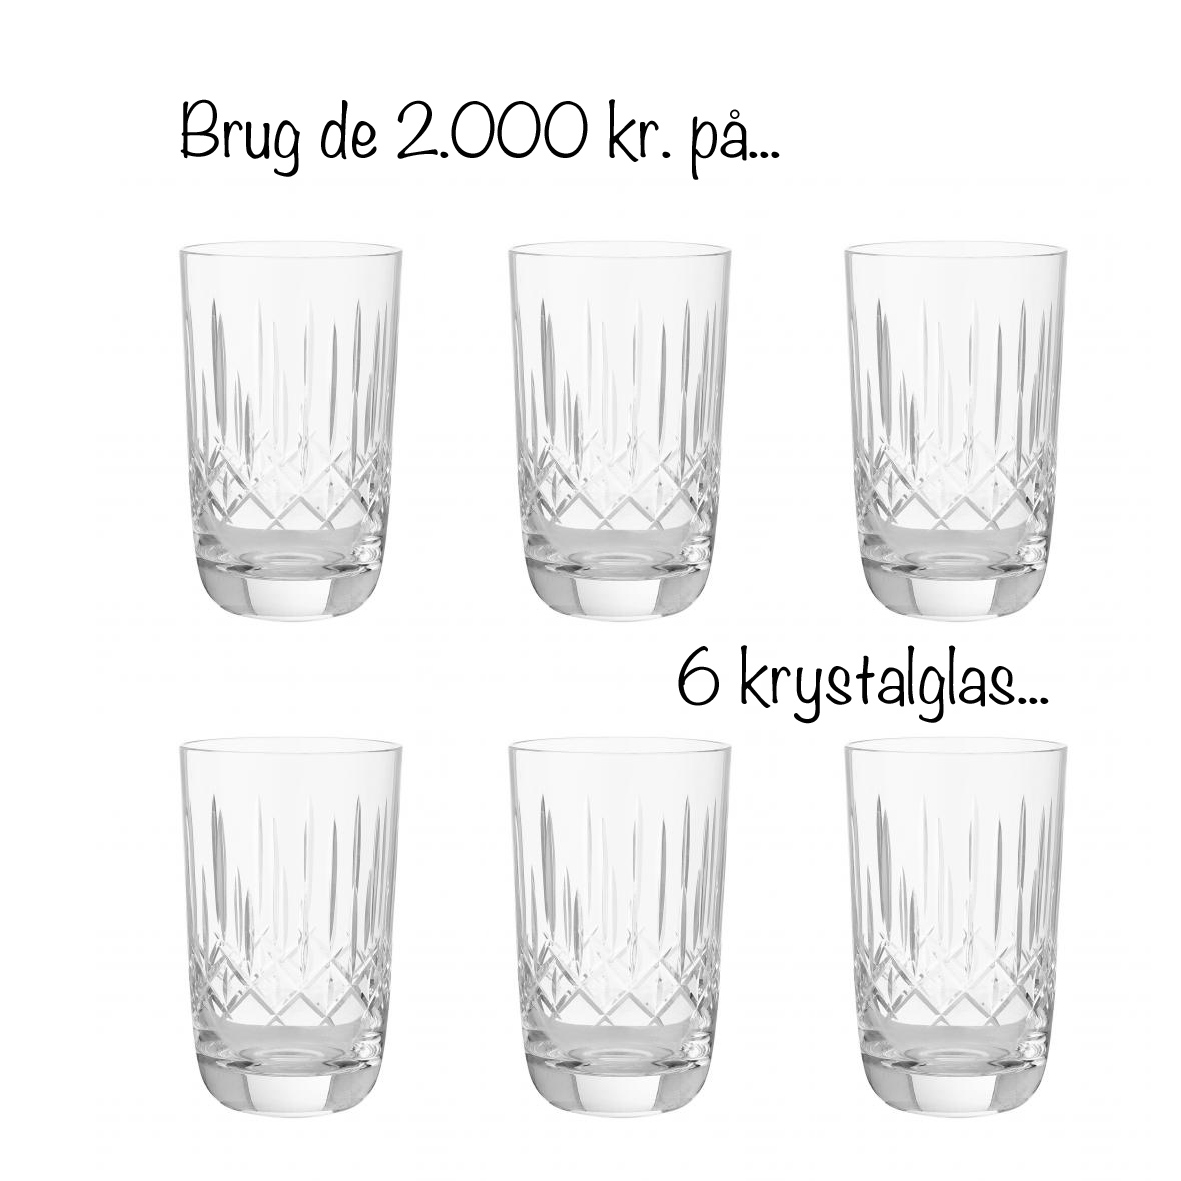 krystalglas-louiseroe-whiskyglas-drinksglas